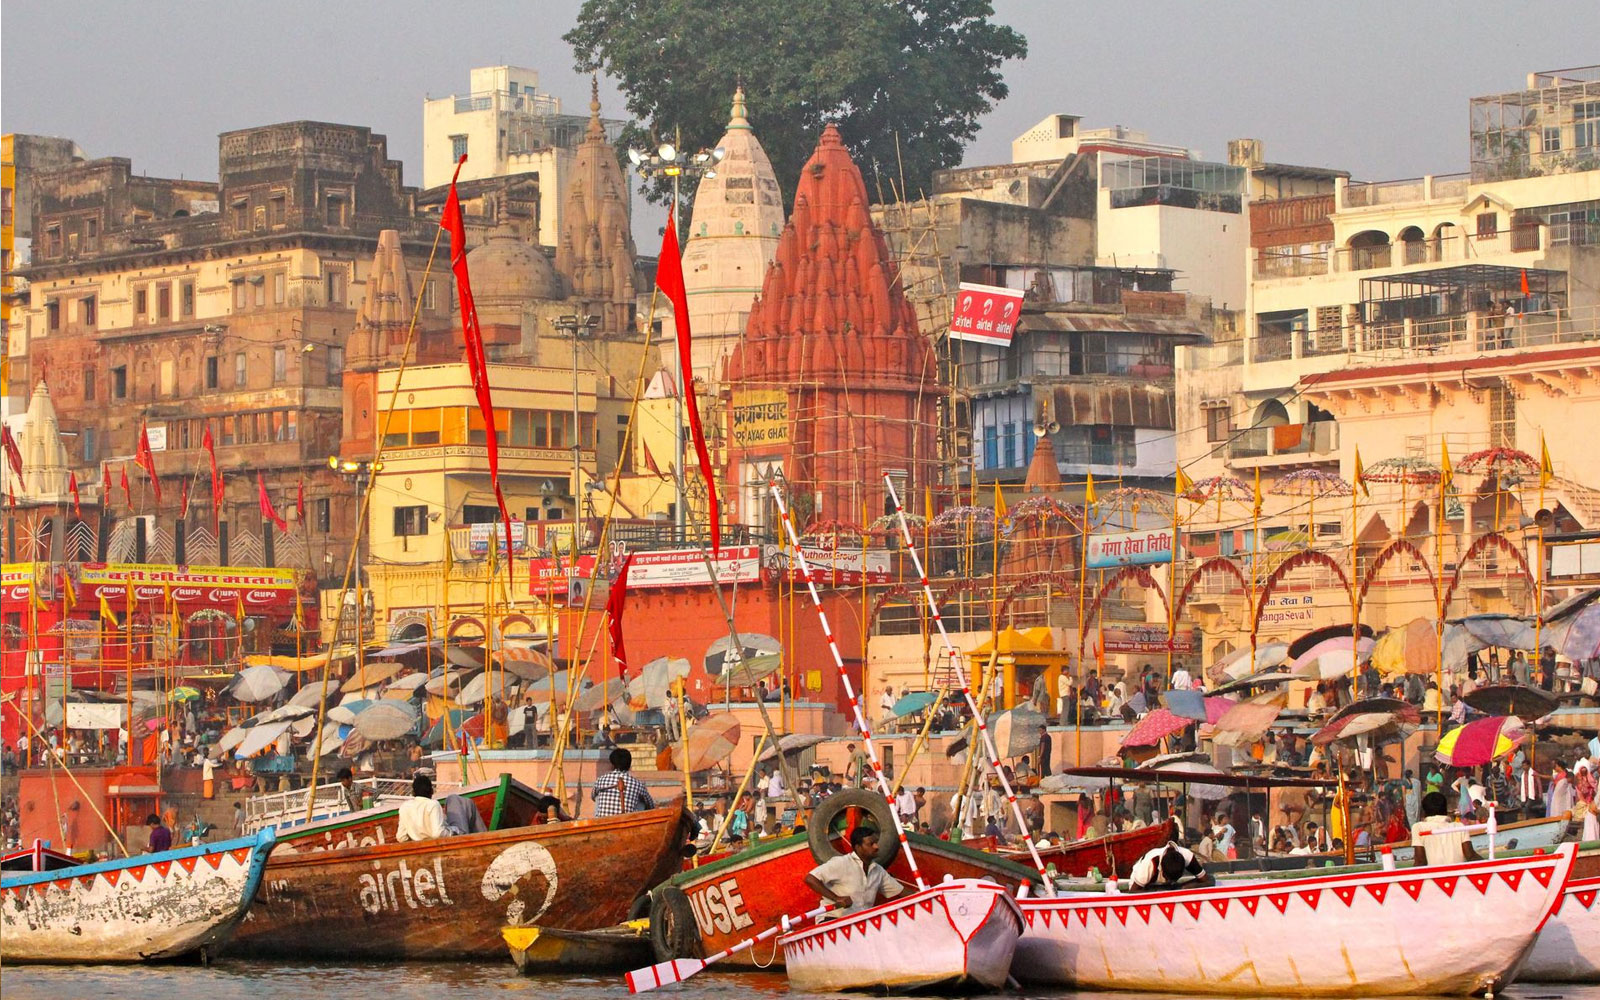 Visit Varanasi during Allahabad Kumbh Mela 2019